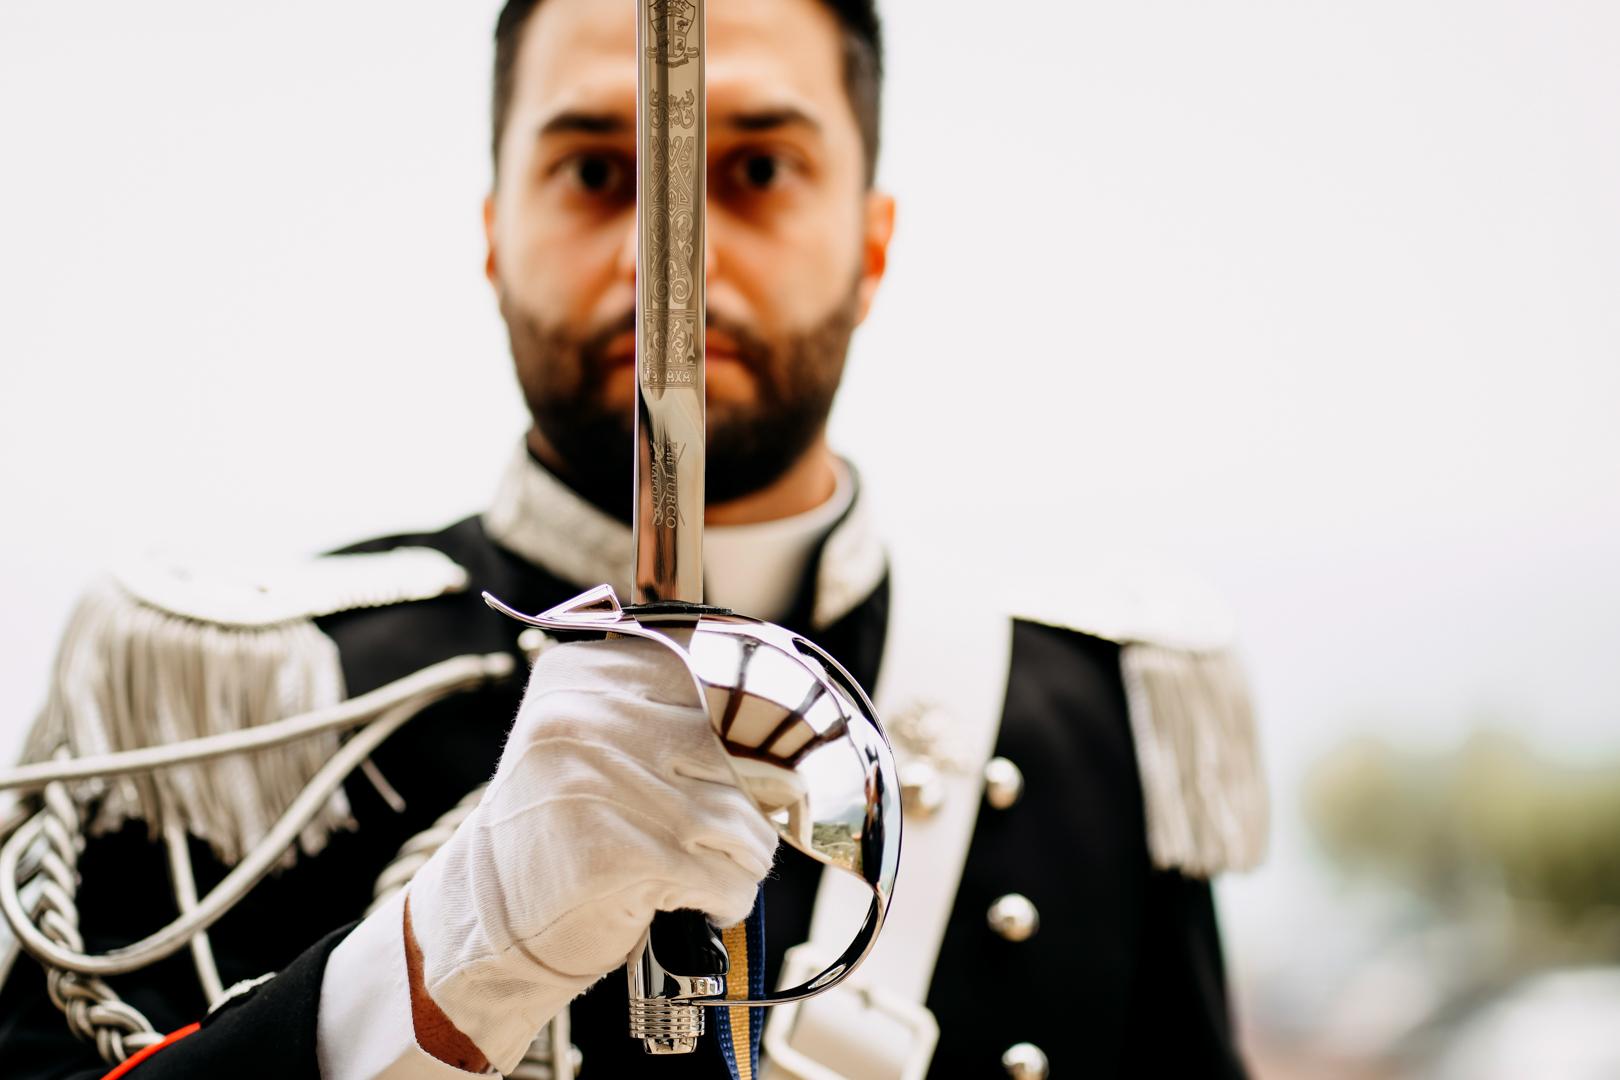 12 sposo-carabiniere-divisa-matrimonio-gianni-lepore-foggia